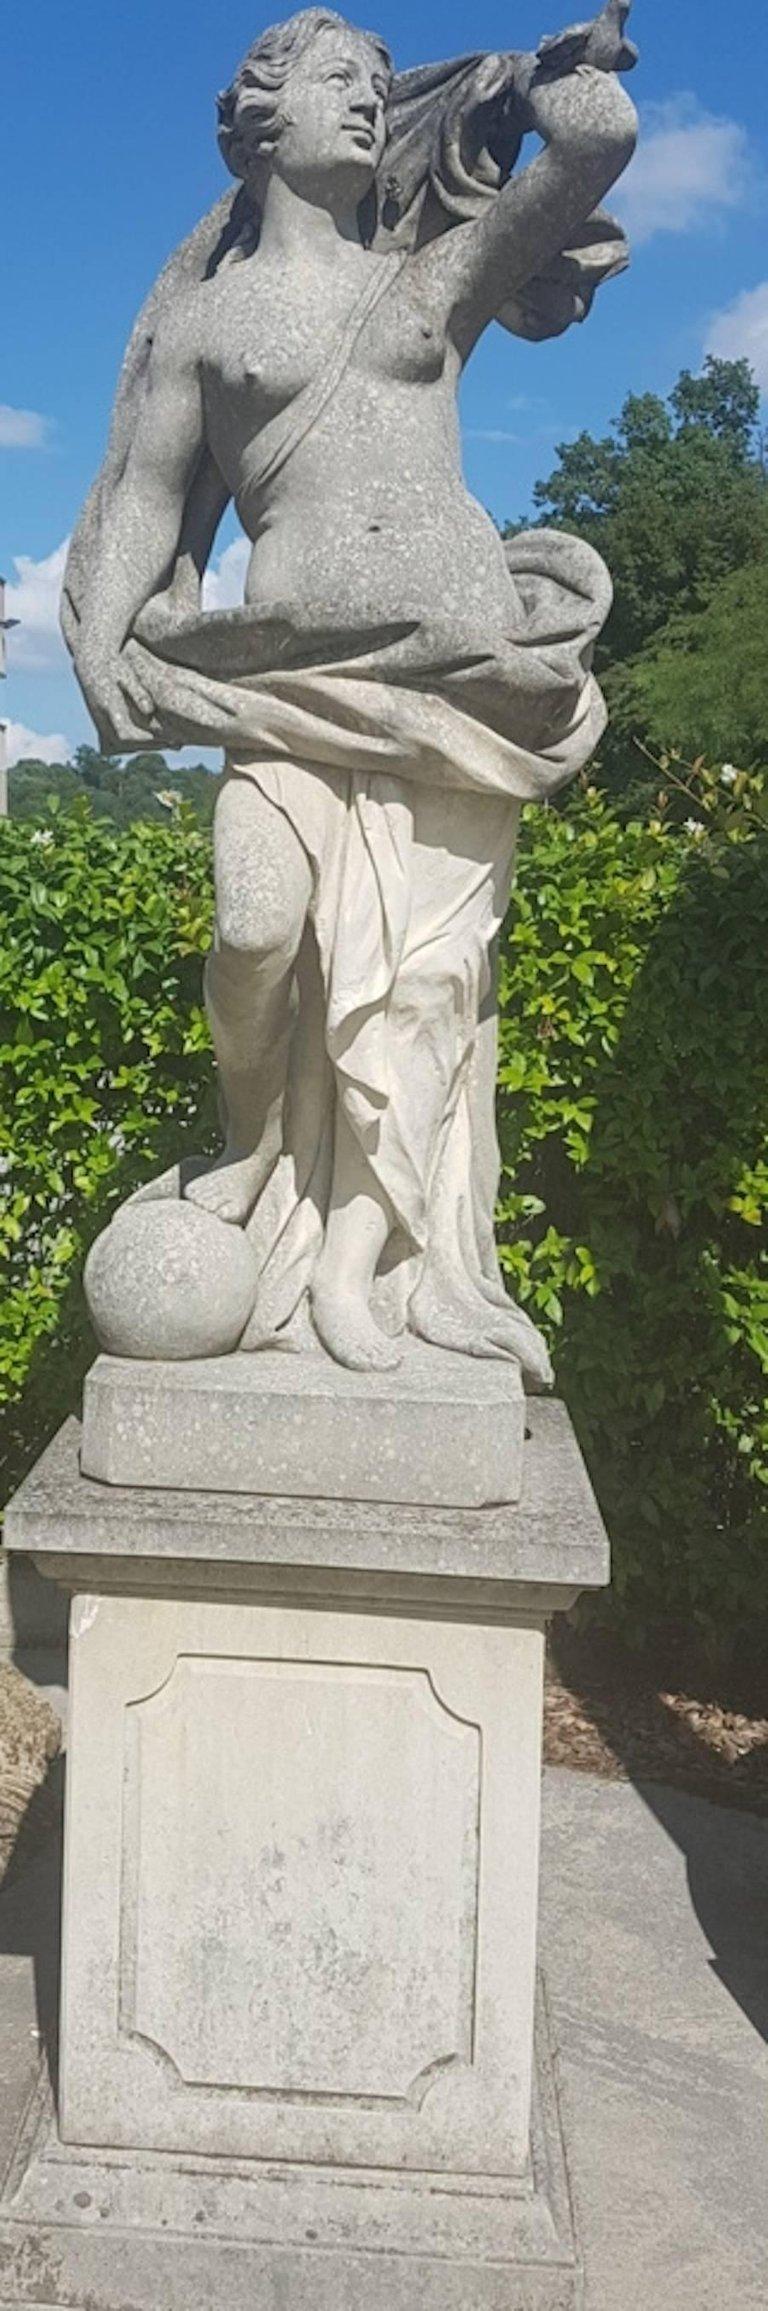 Italian Limestone Garden Sculptures of Aria a  Roman Goddness   For Sale 1